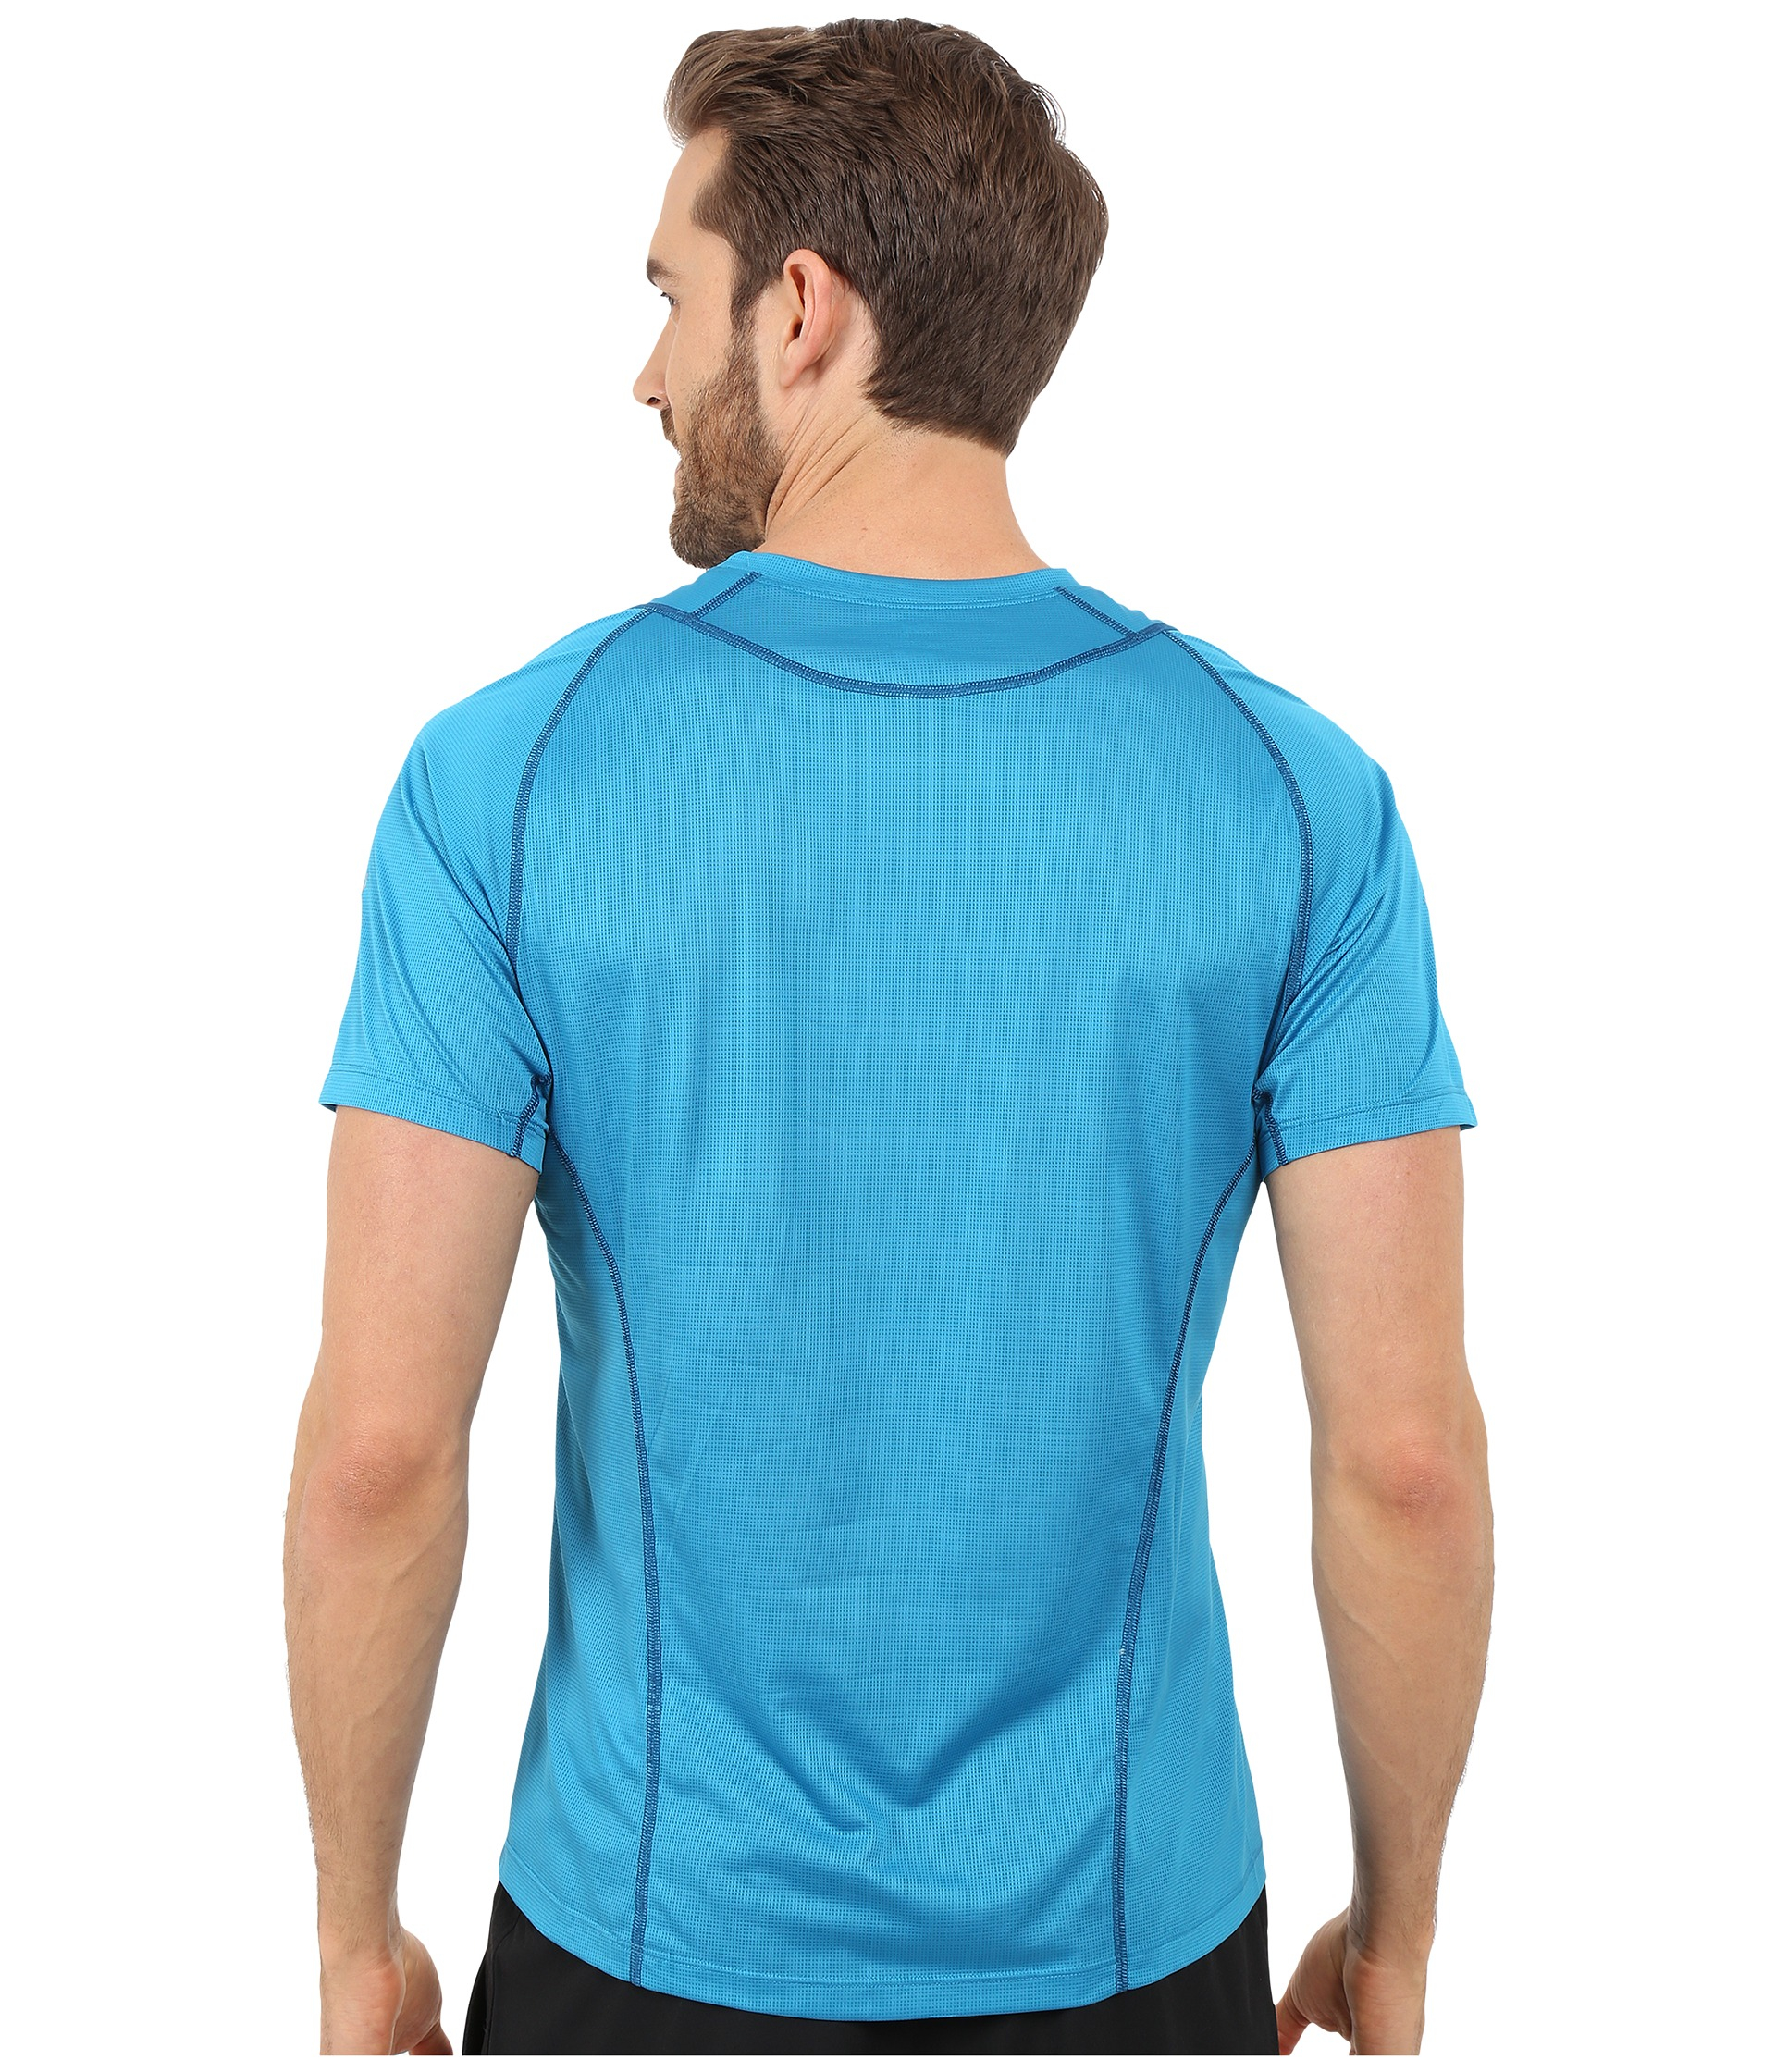 Arc Teryx Sarix Short Sleeve In Blue For Men Adriatic